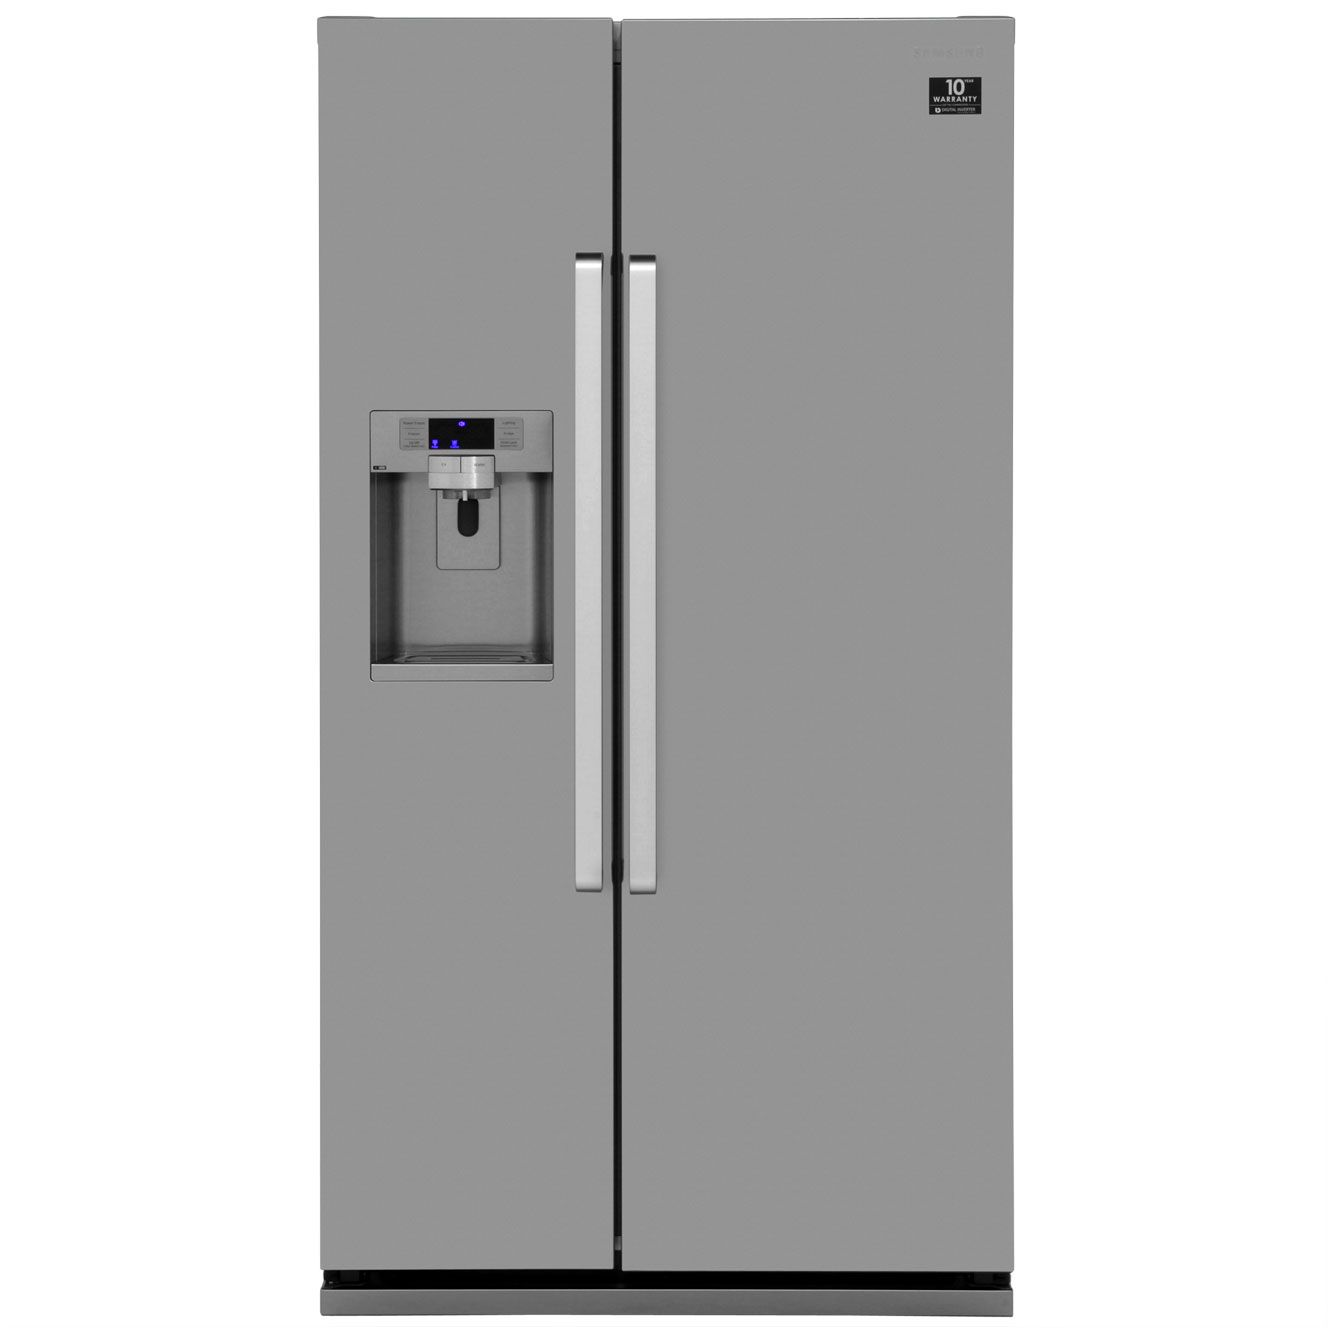 Samsung G-Series RSG5UCRS American Fridge Freezer - Stainless ...